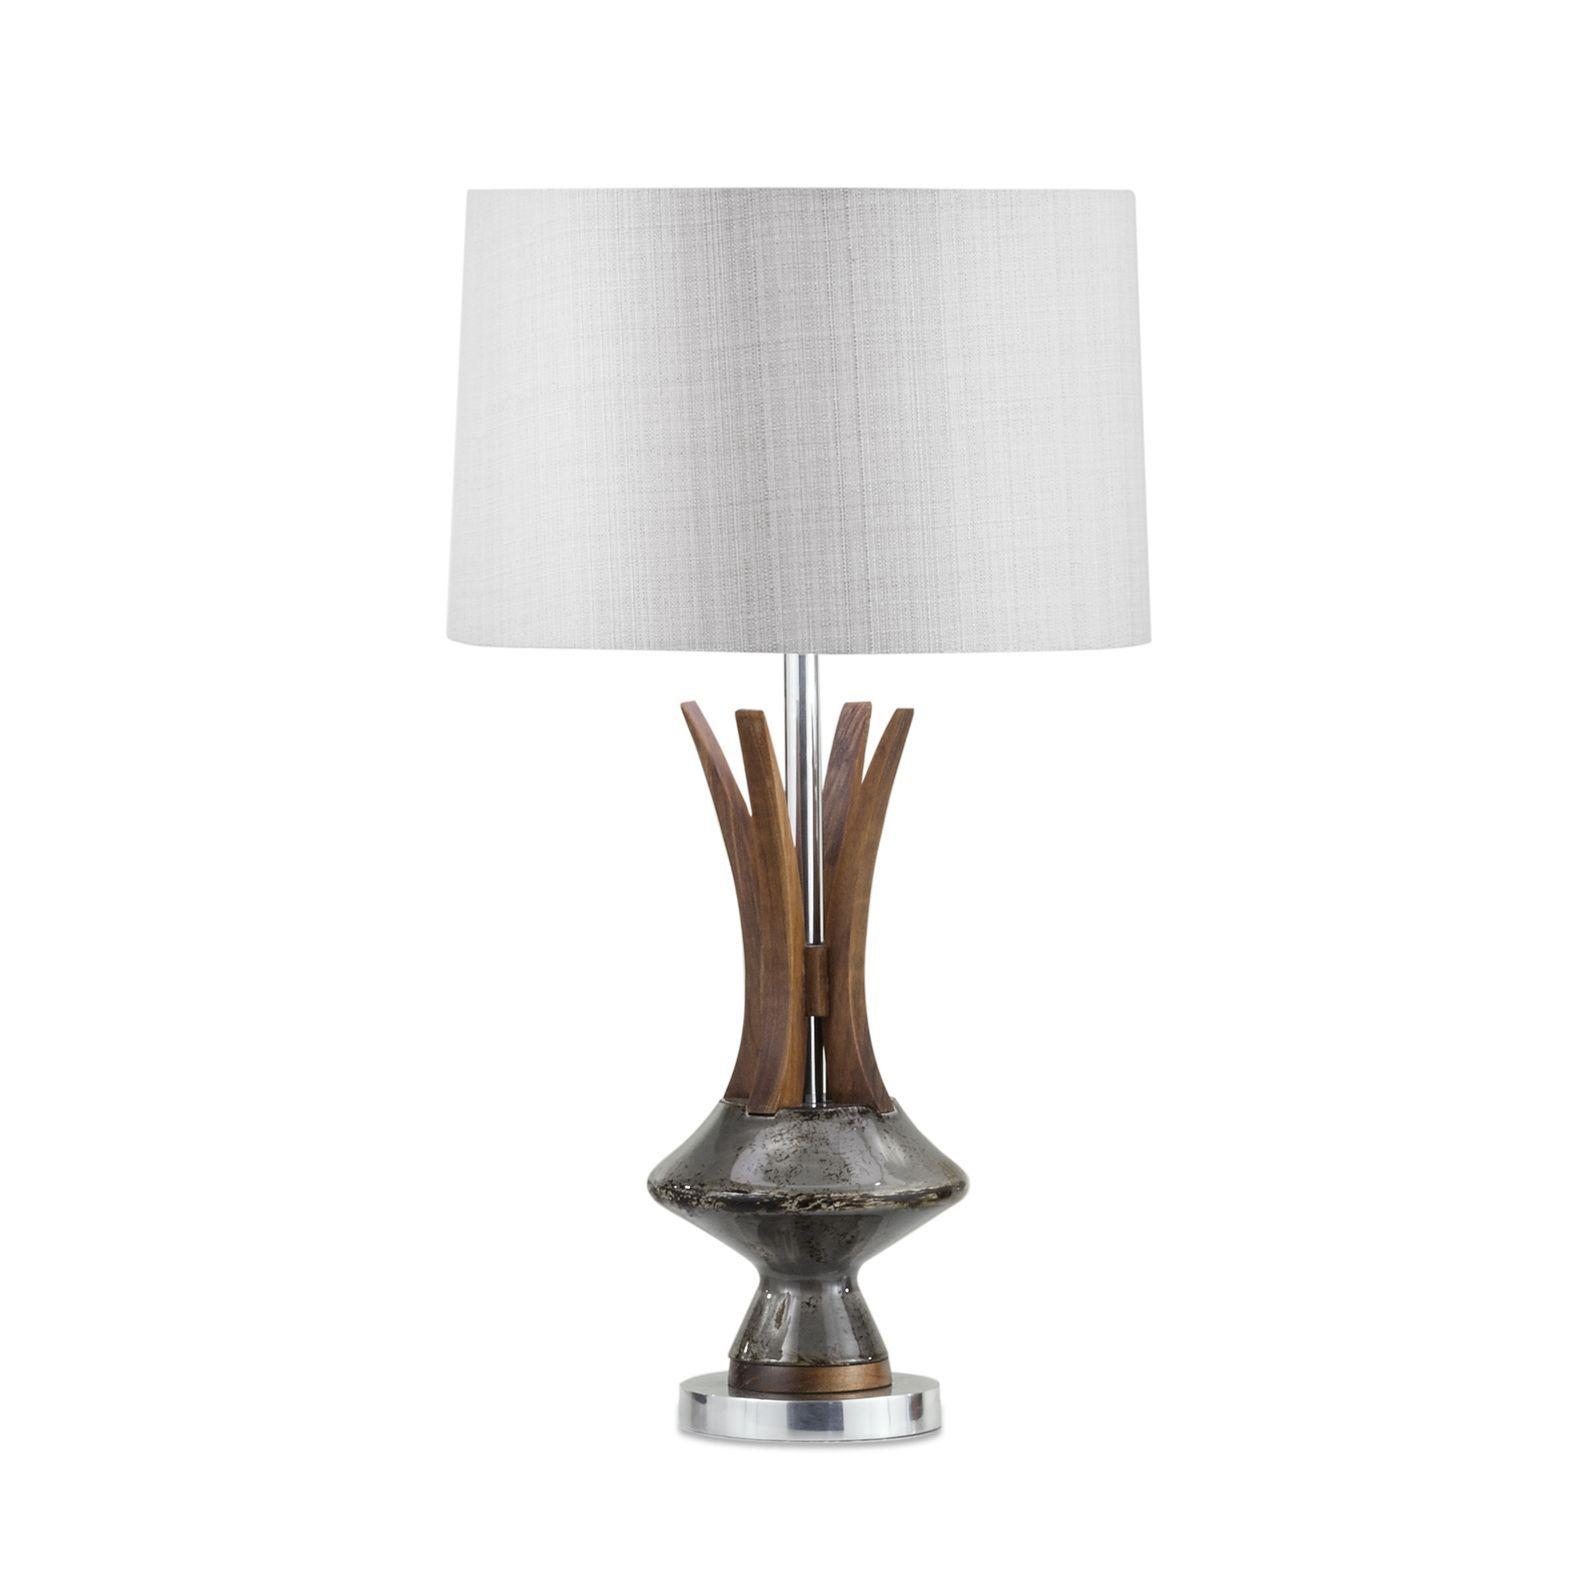 Nova Lighting Reina Table Lamp